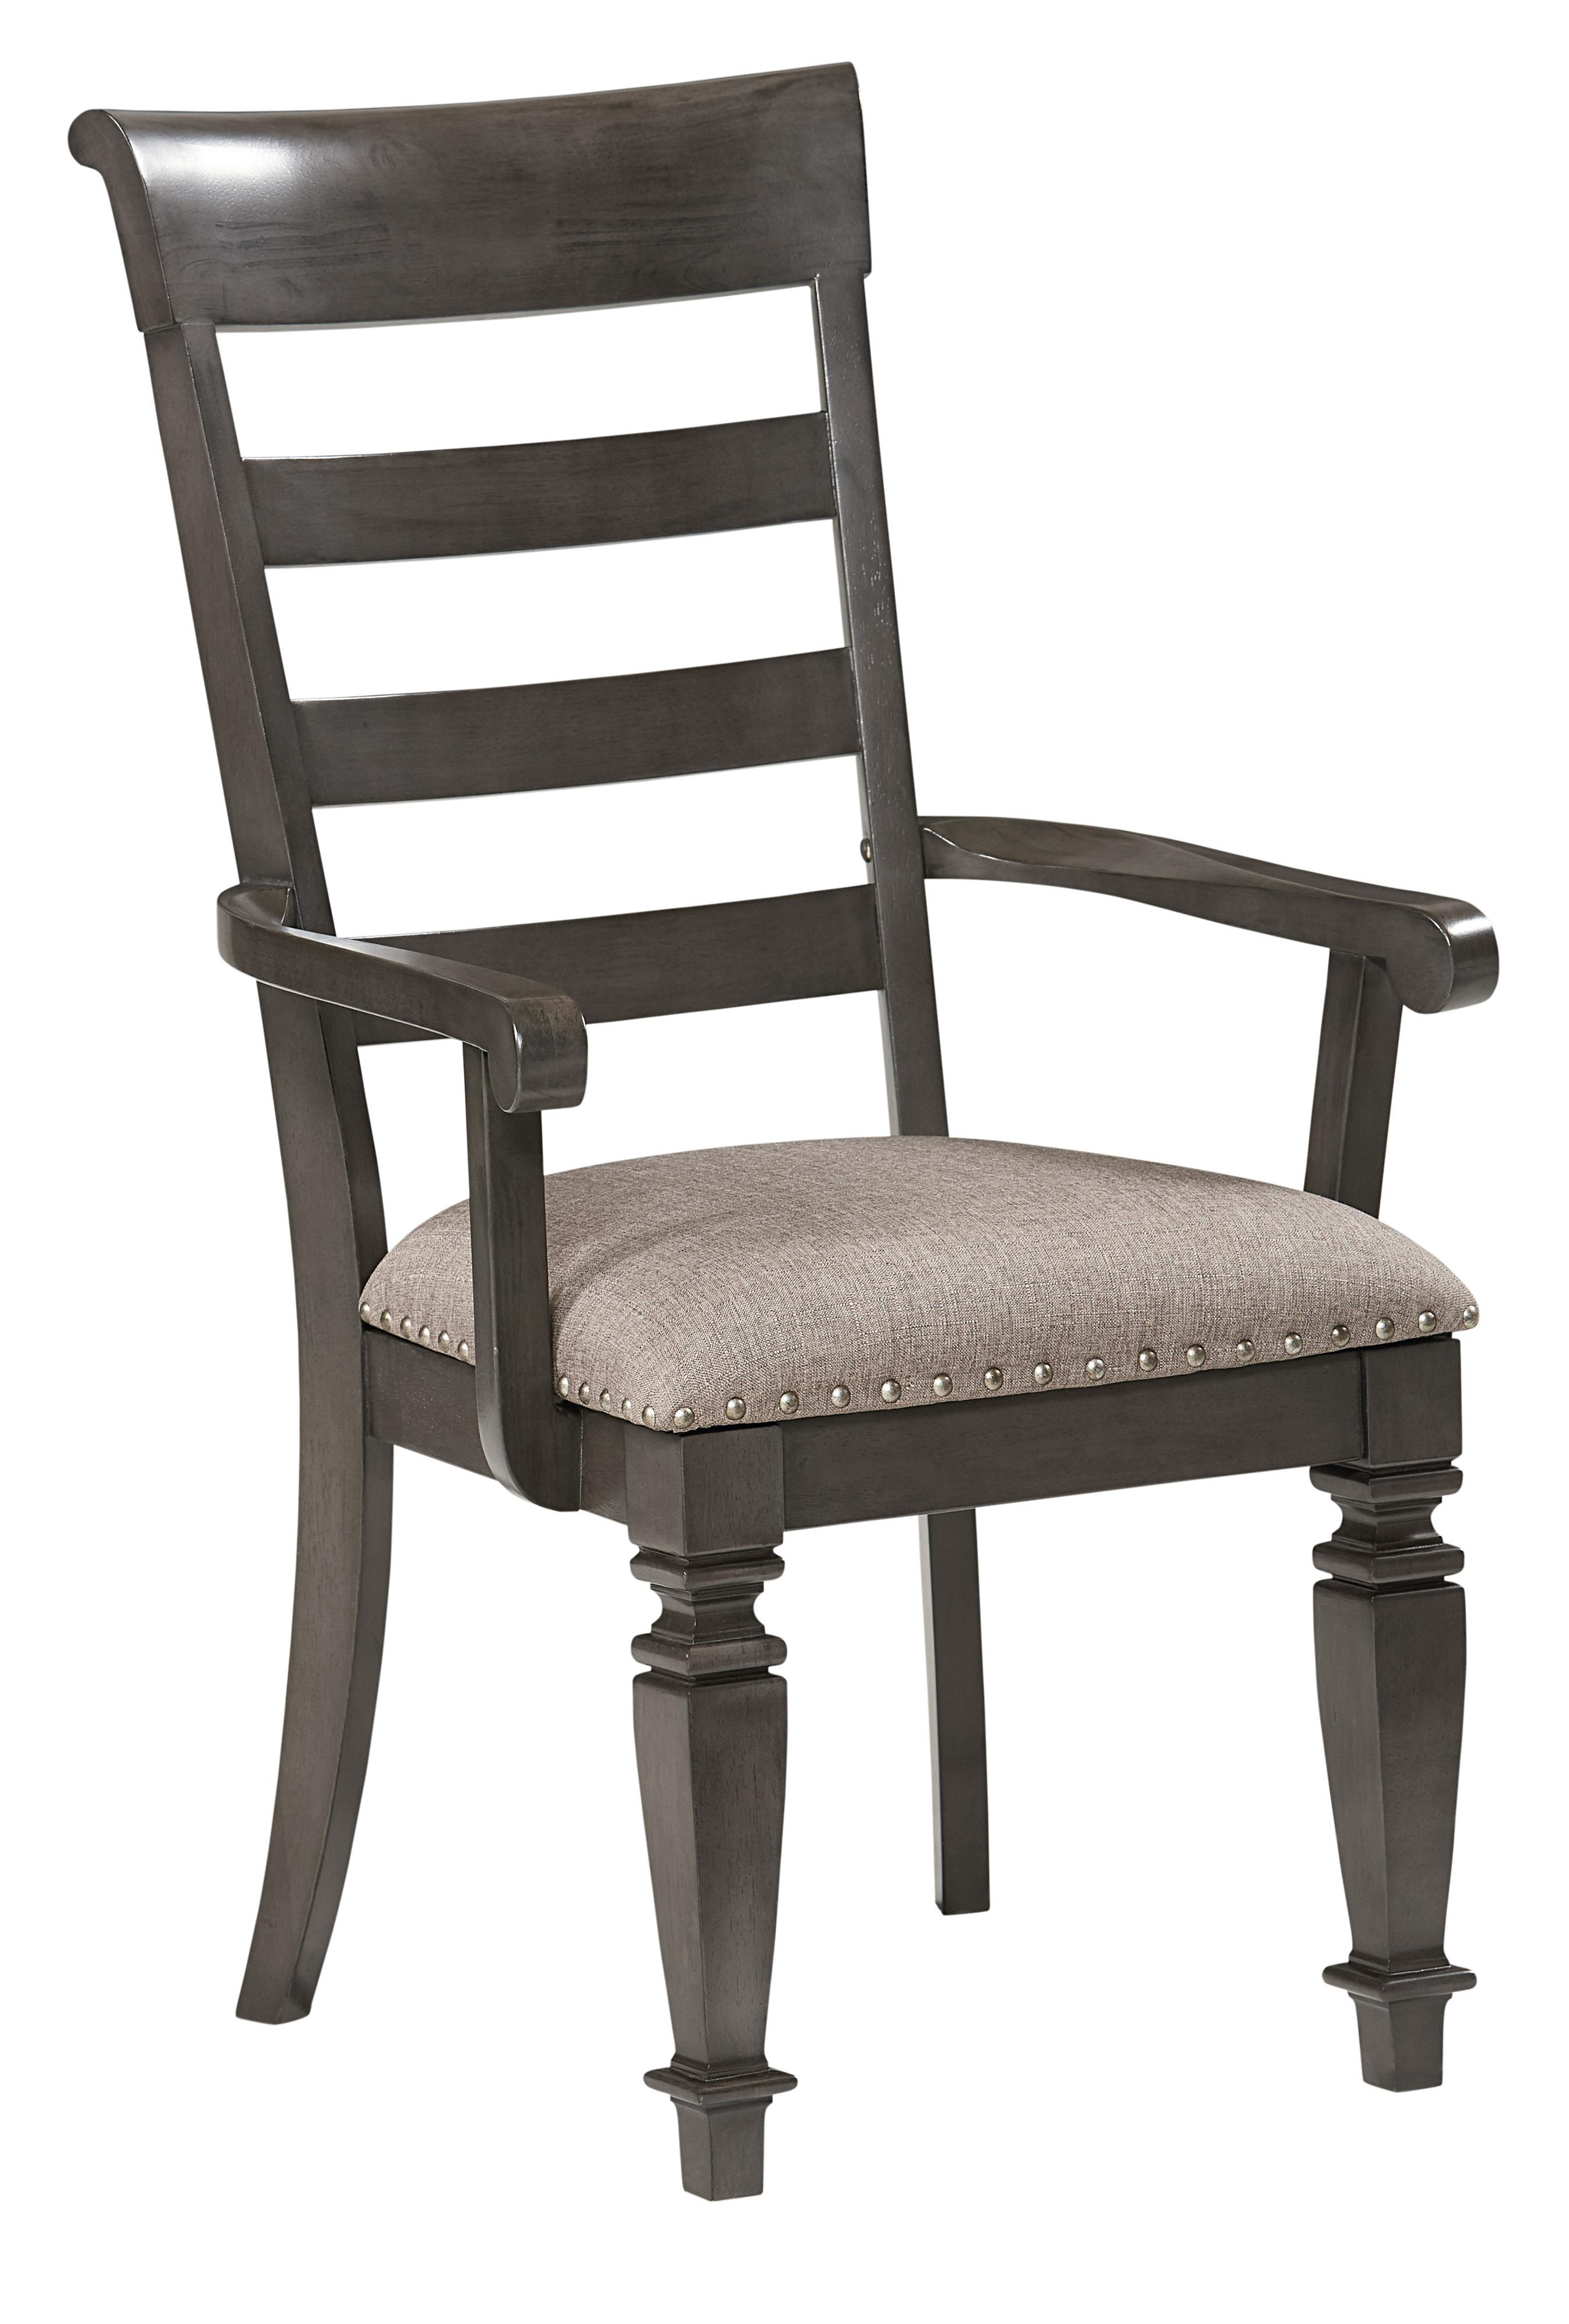 Standard Furniture Garrison Traditional Upholstered Arm